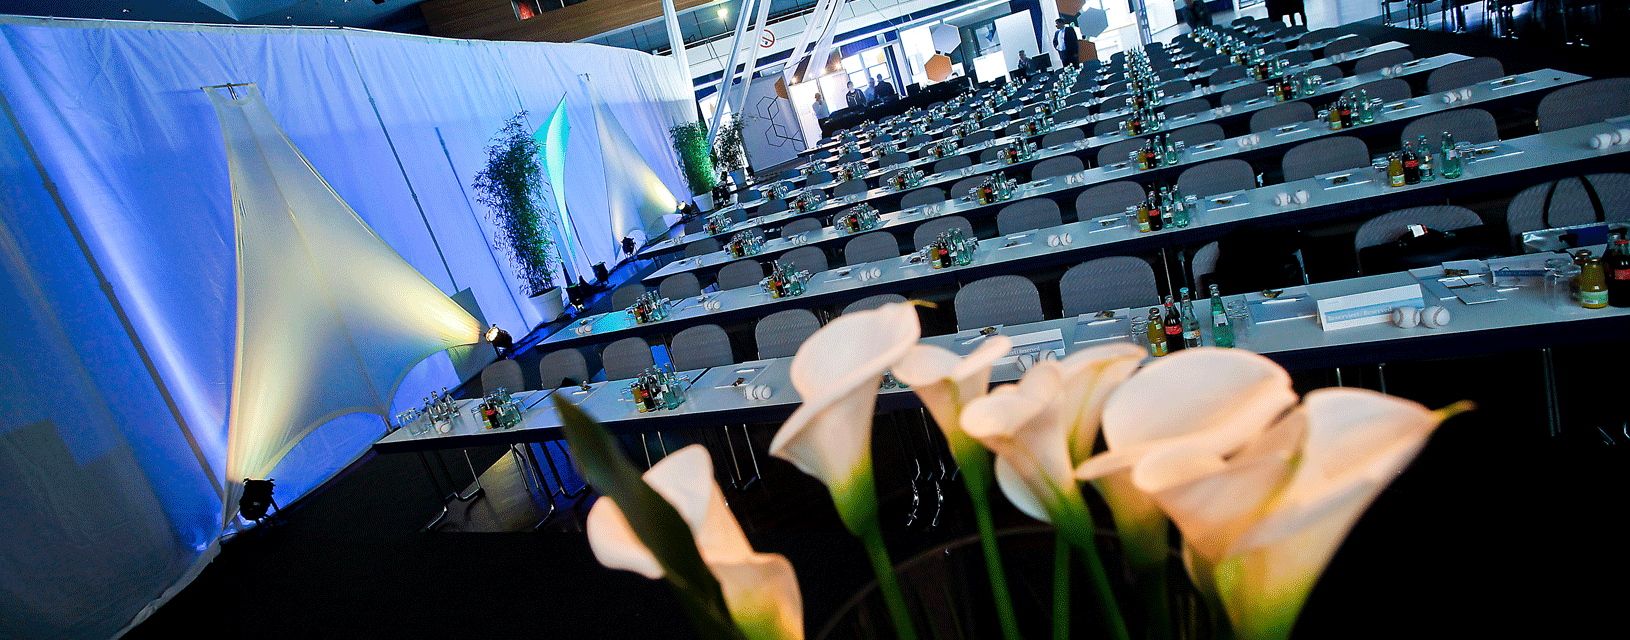 event-agentur-wiesbaden-event